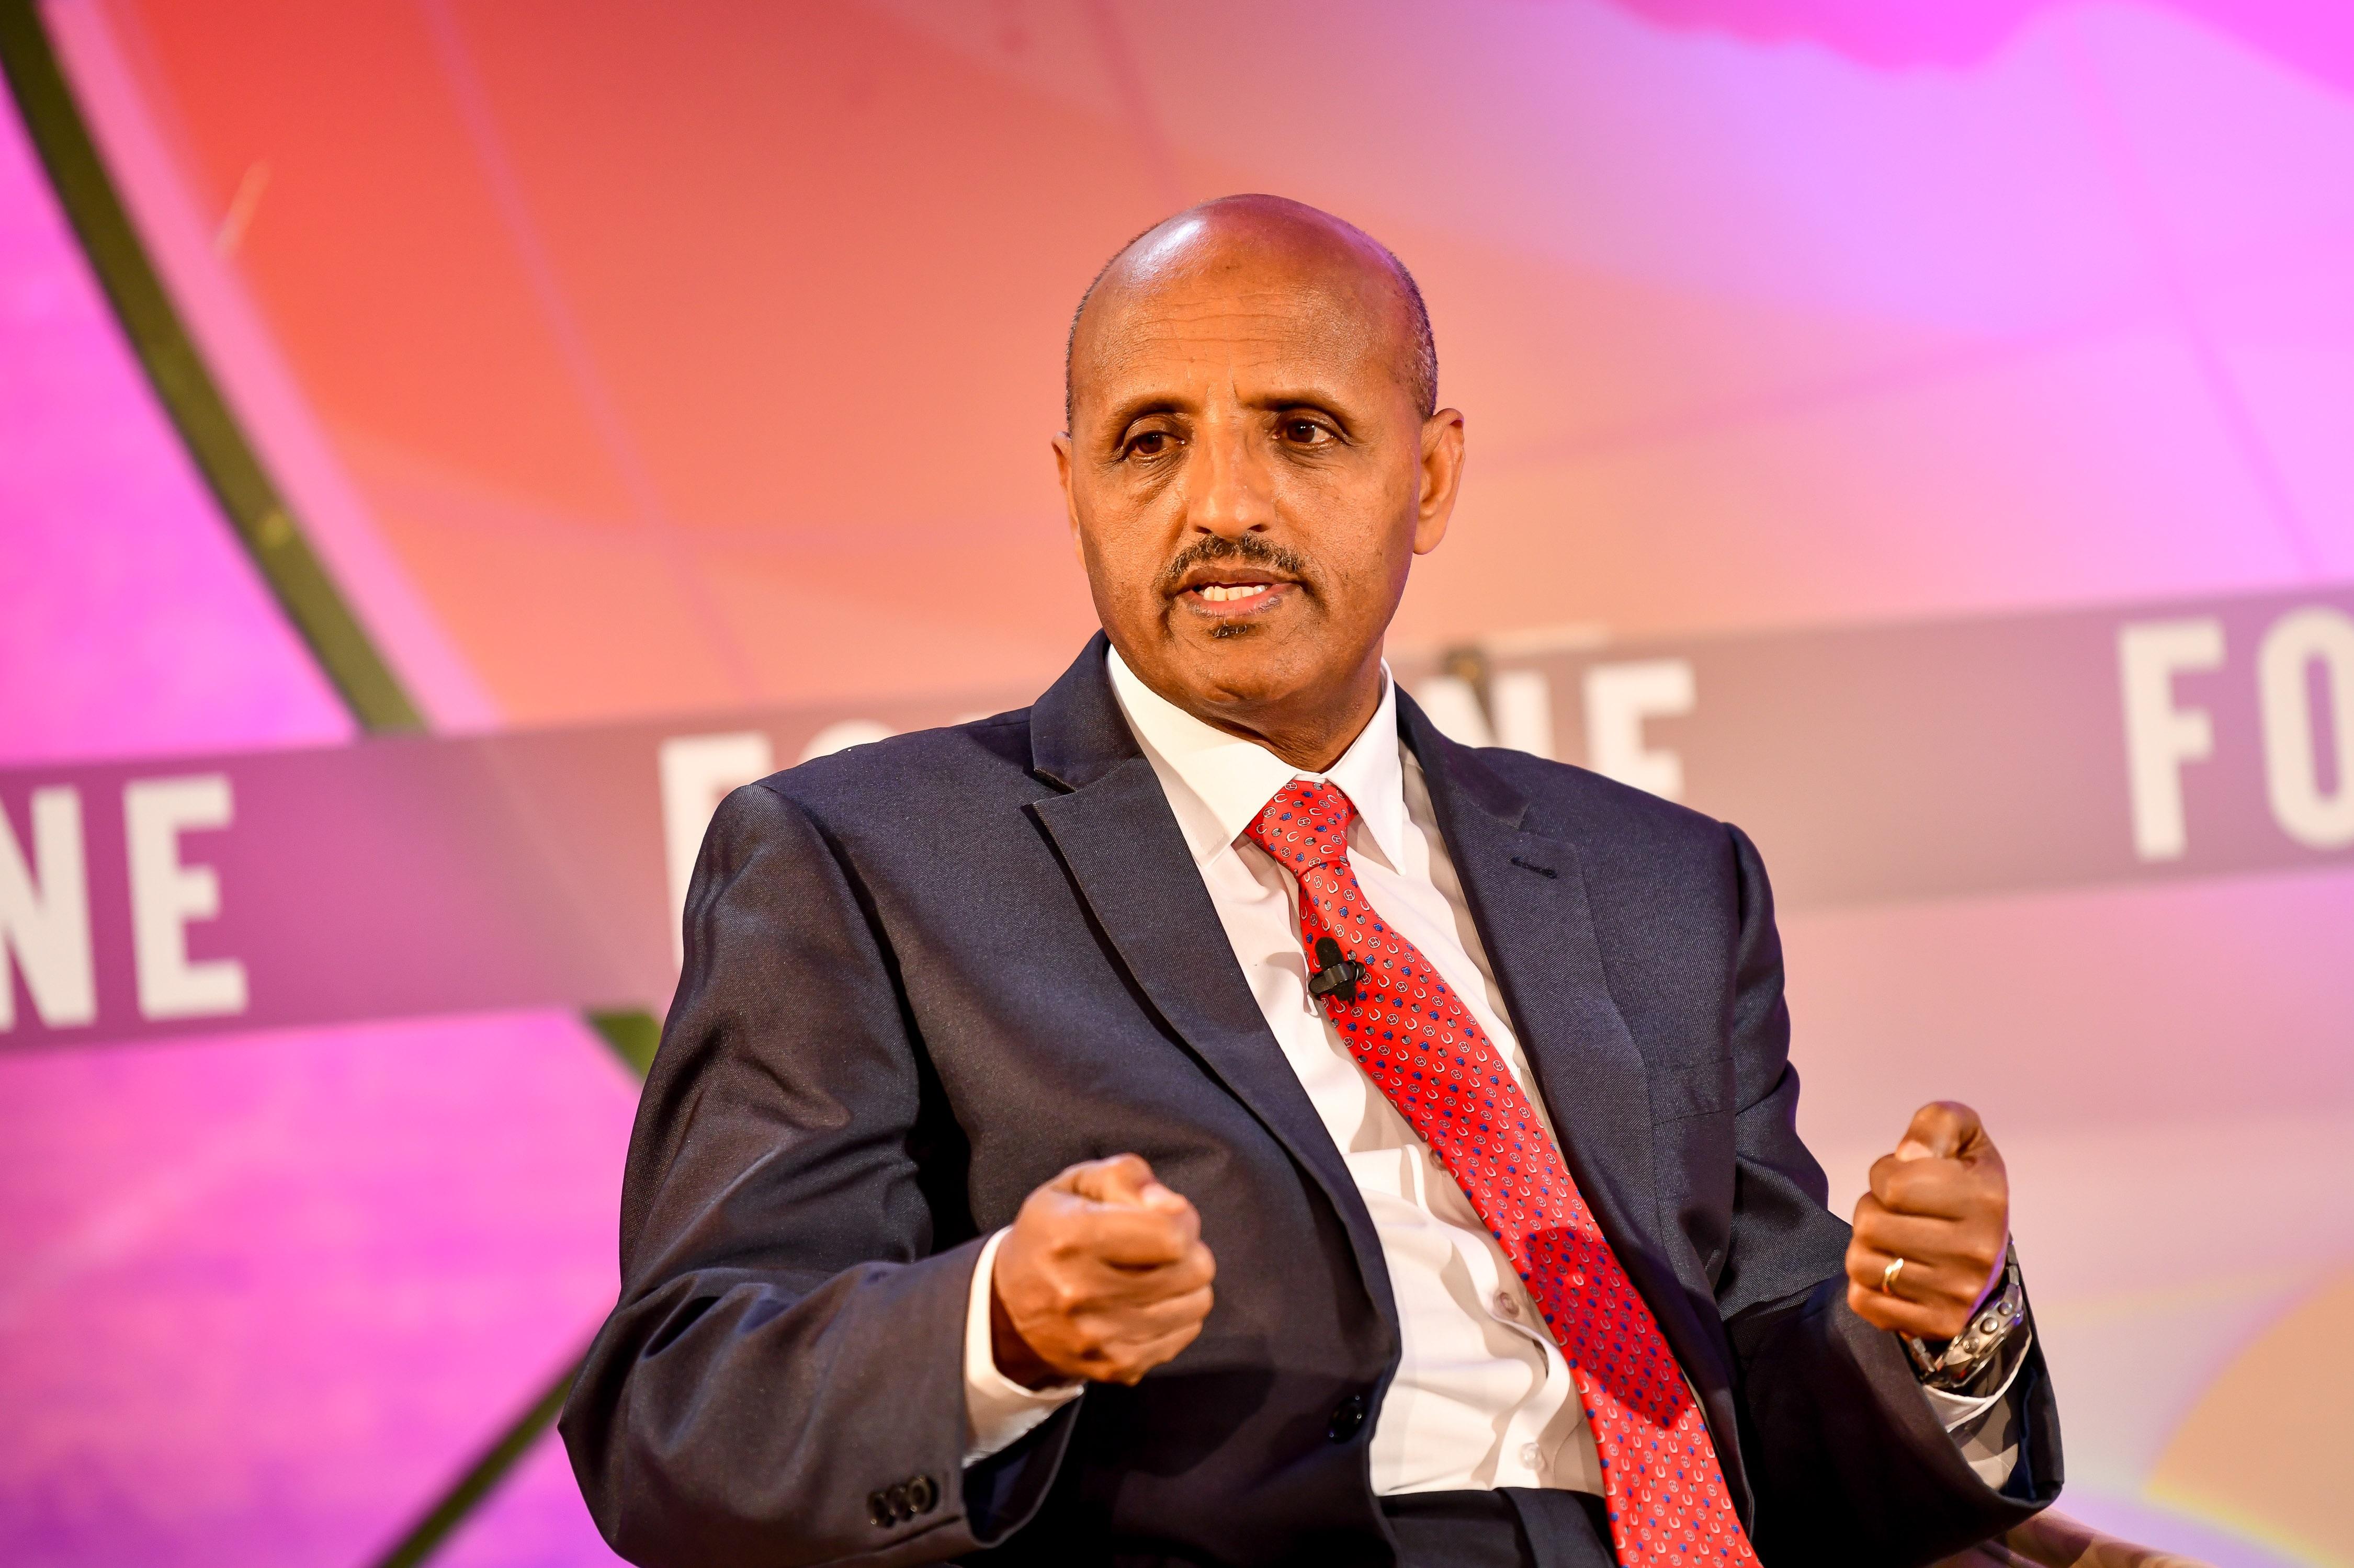 Tewolde Gebremariam – Ethiopian Airlines